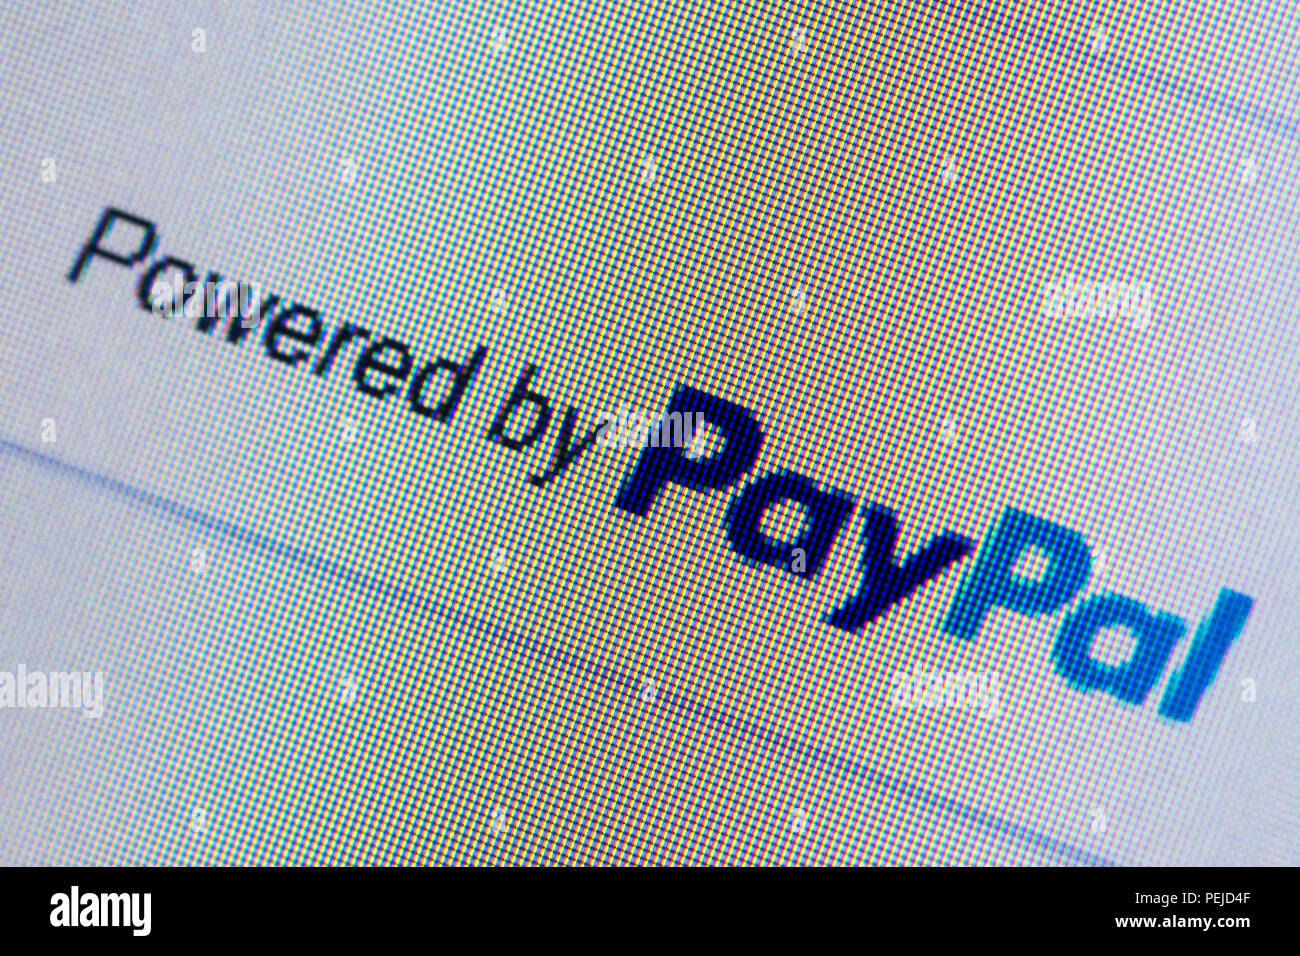 PayPal website - computer screenshot and logo - Stock Image